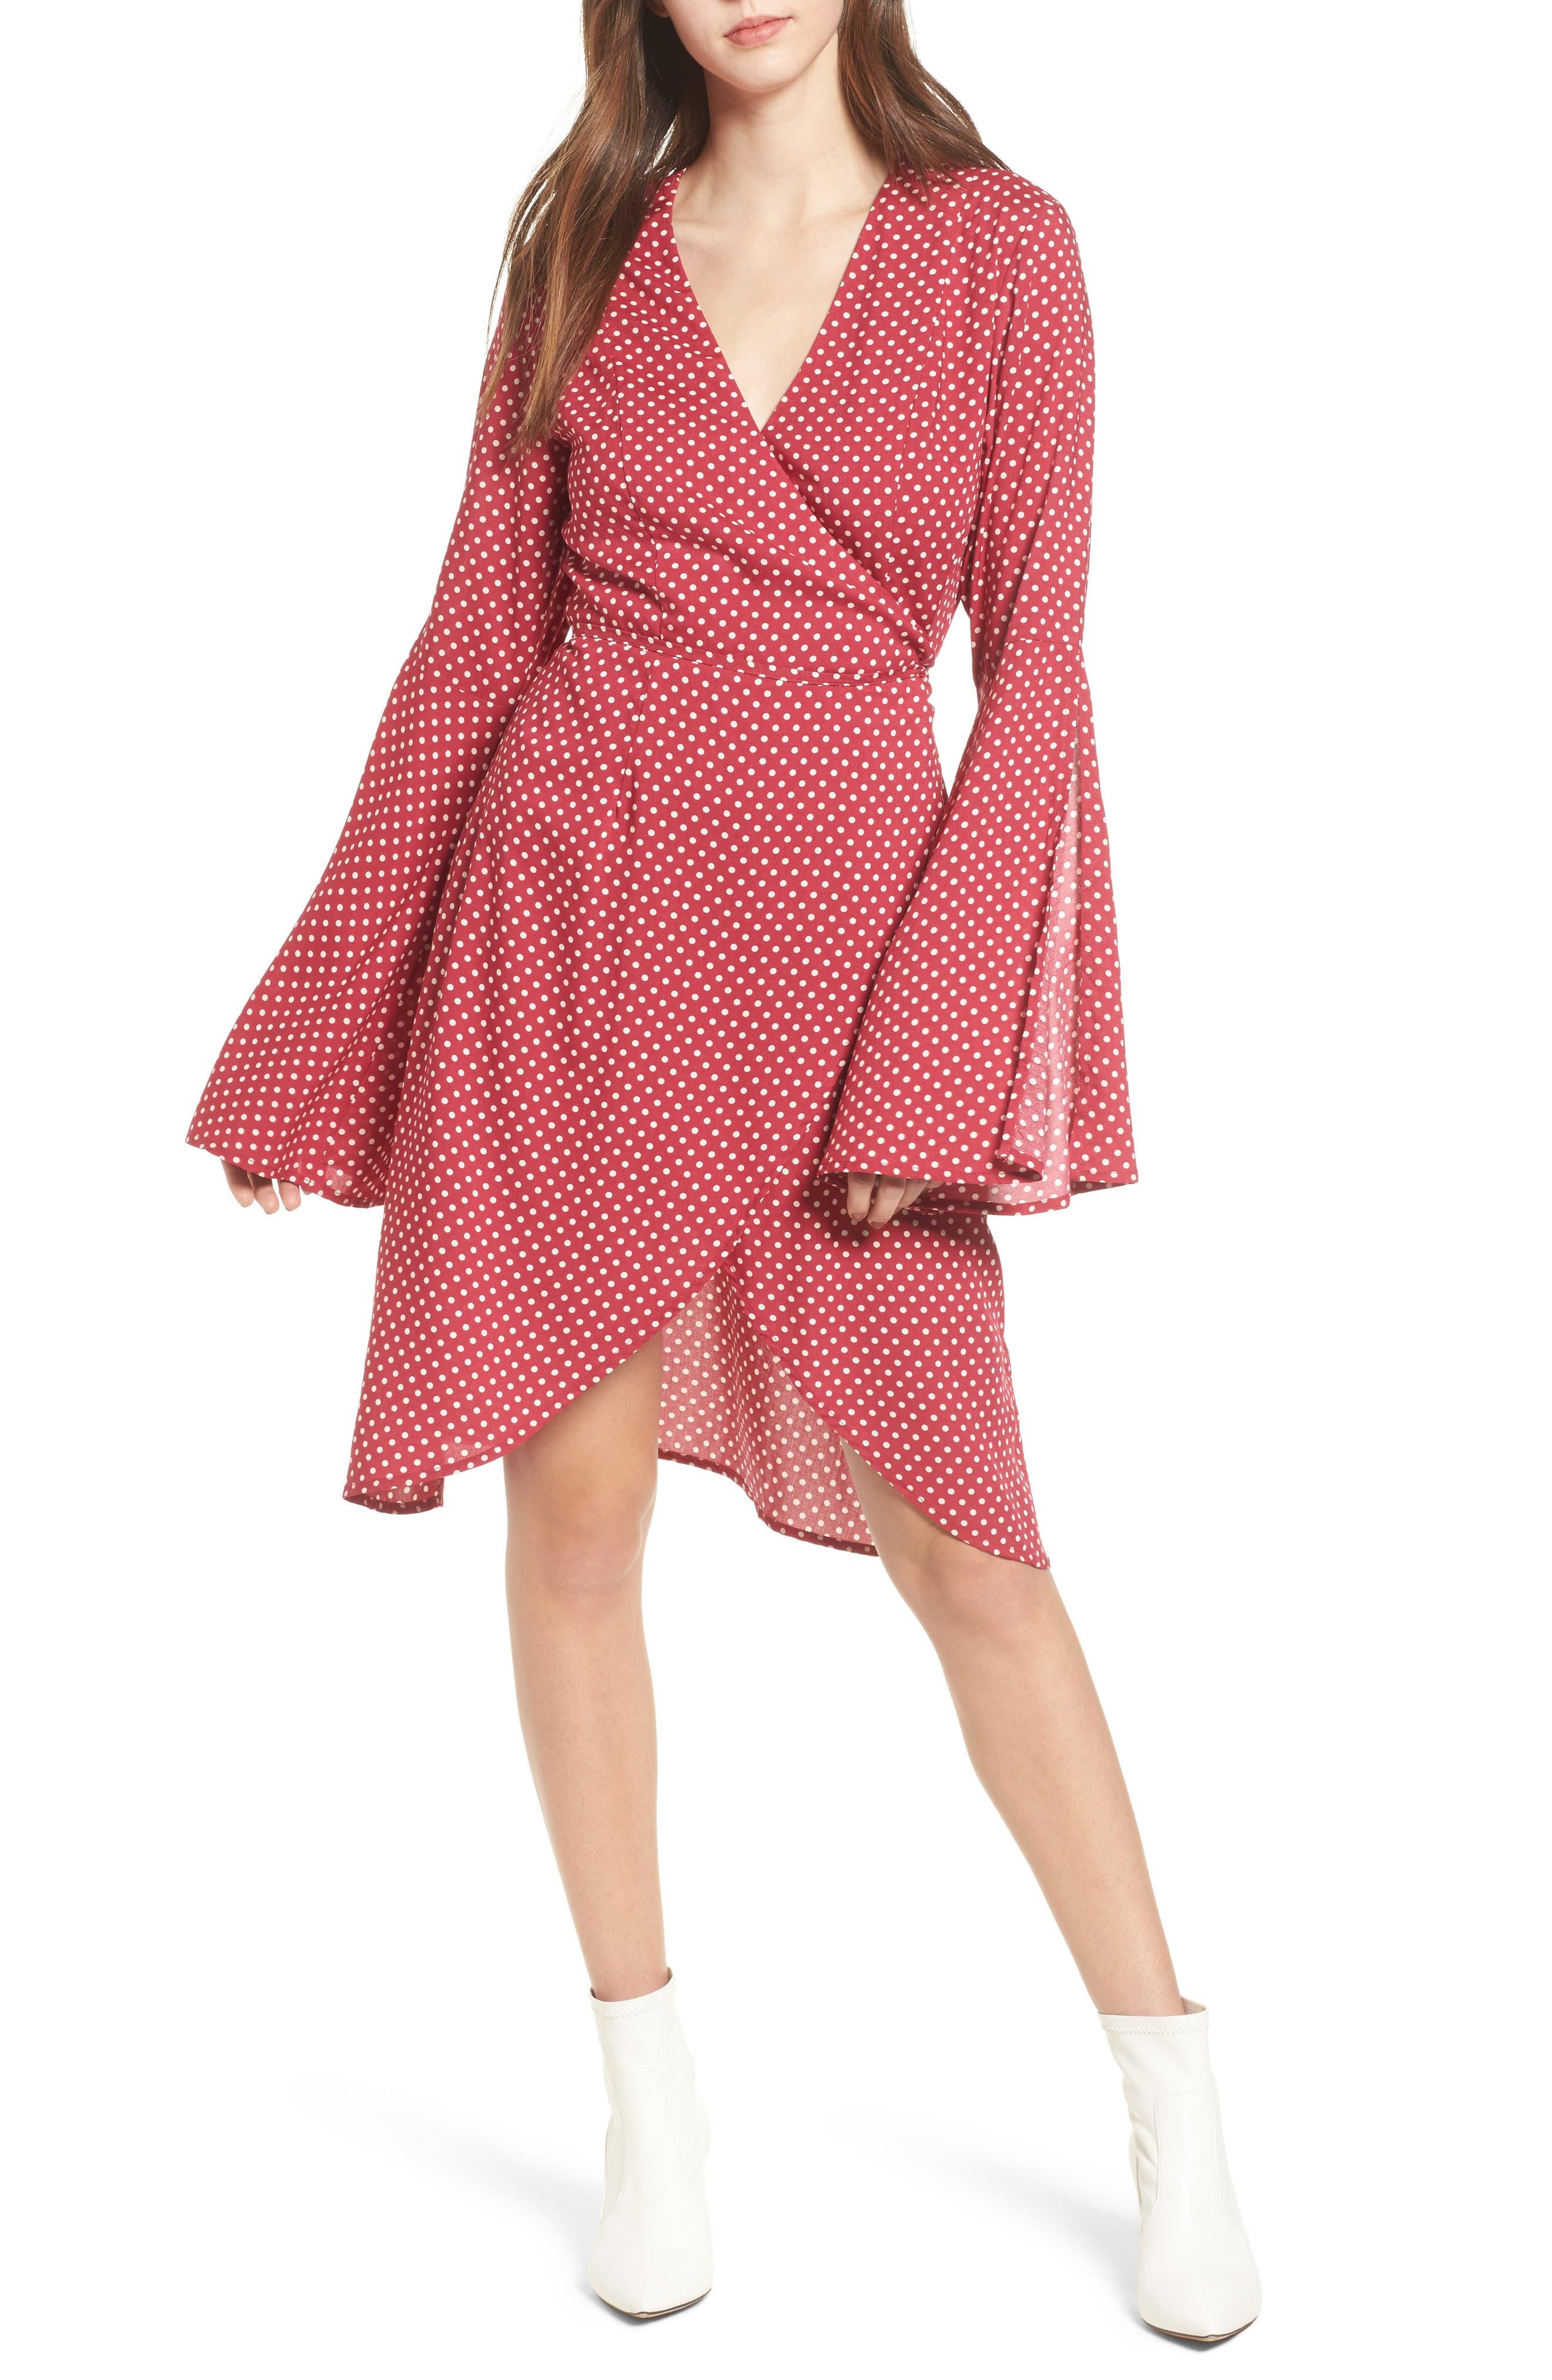 Fearless Polka Dot Wrap Dress,                             Main thumbnail 1, color,                             Multi Red